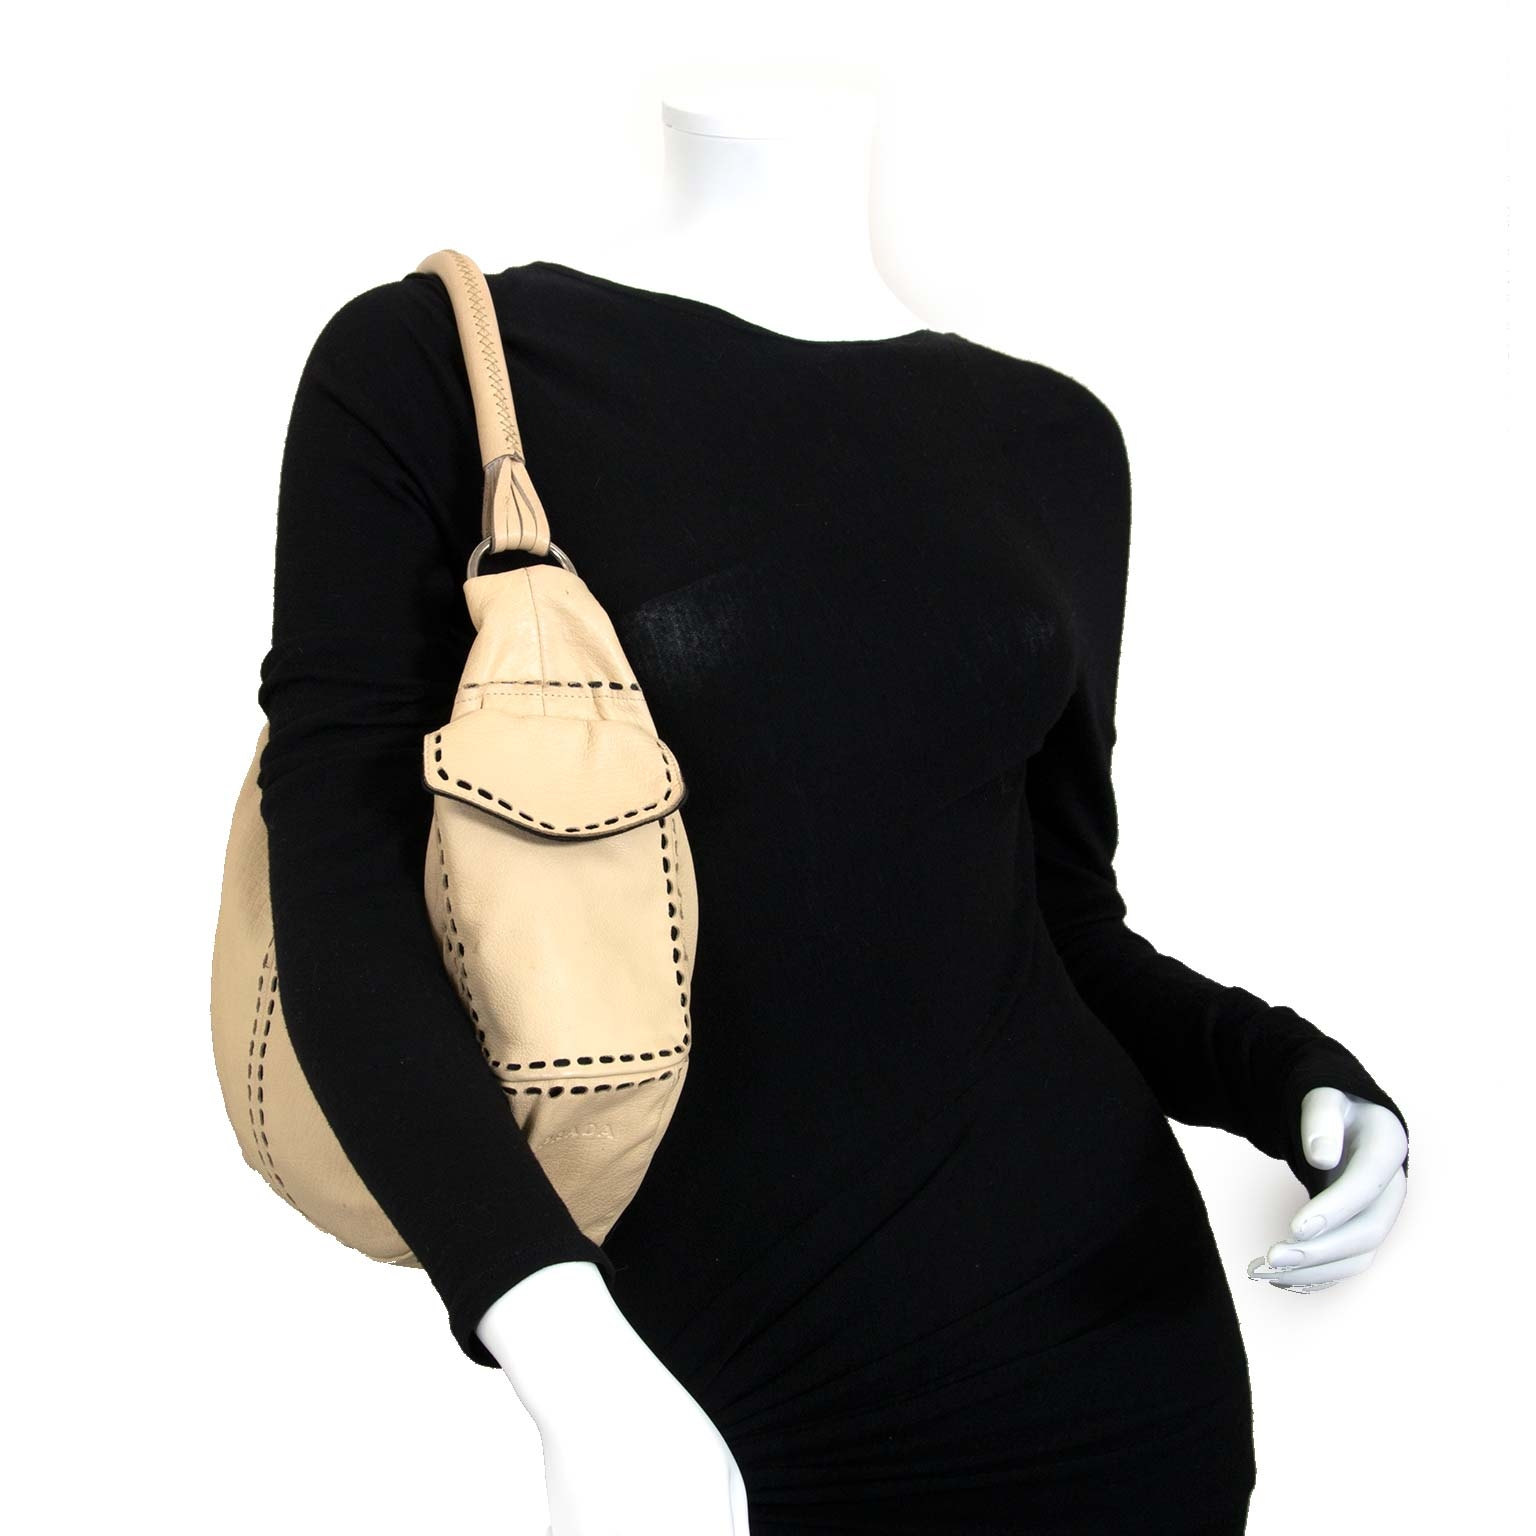 prada beige leder handtas nu te koop bij labellov vintage mode webshop belgië